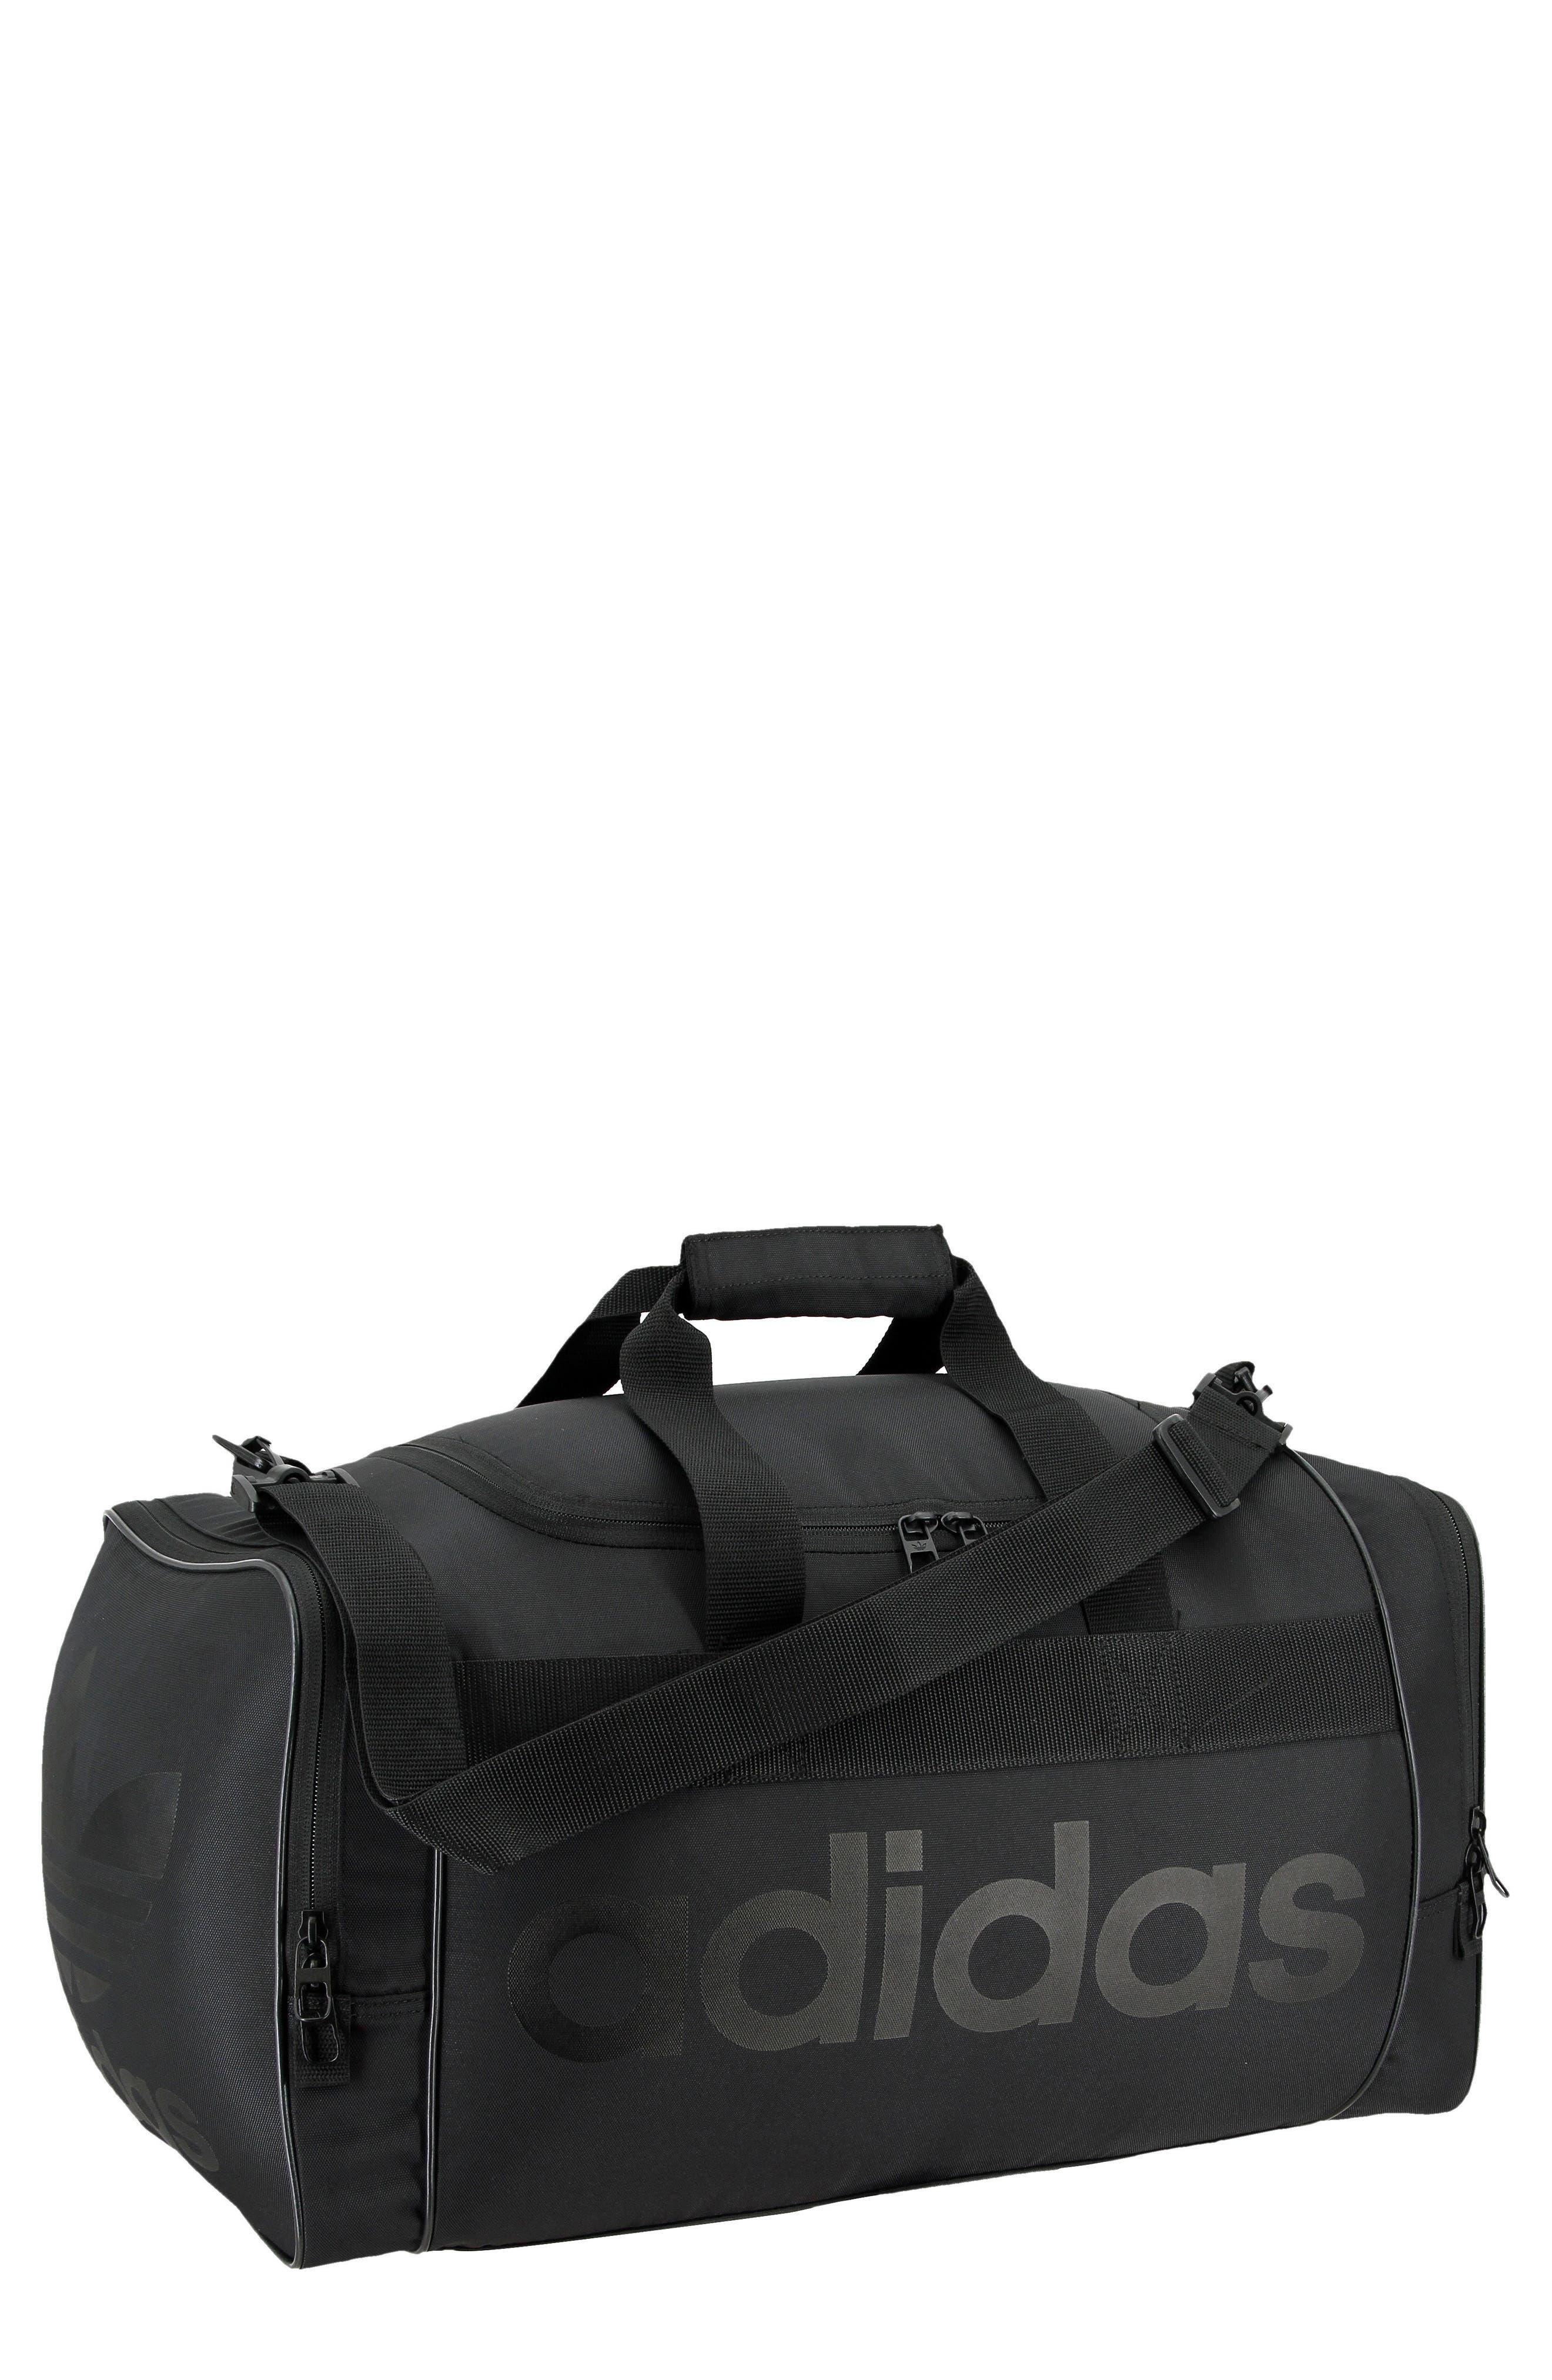 Santiago Duffel Bag,                         Main,                         color, BLACK/ BLACK